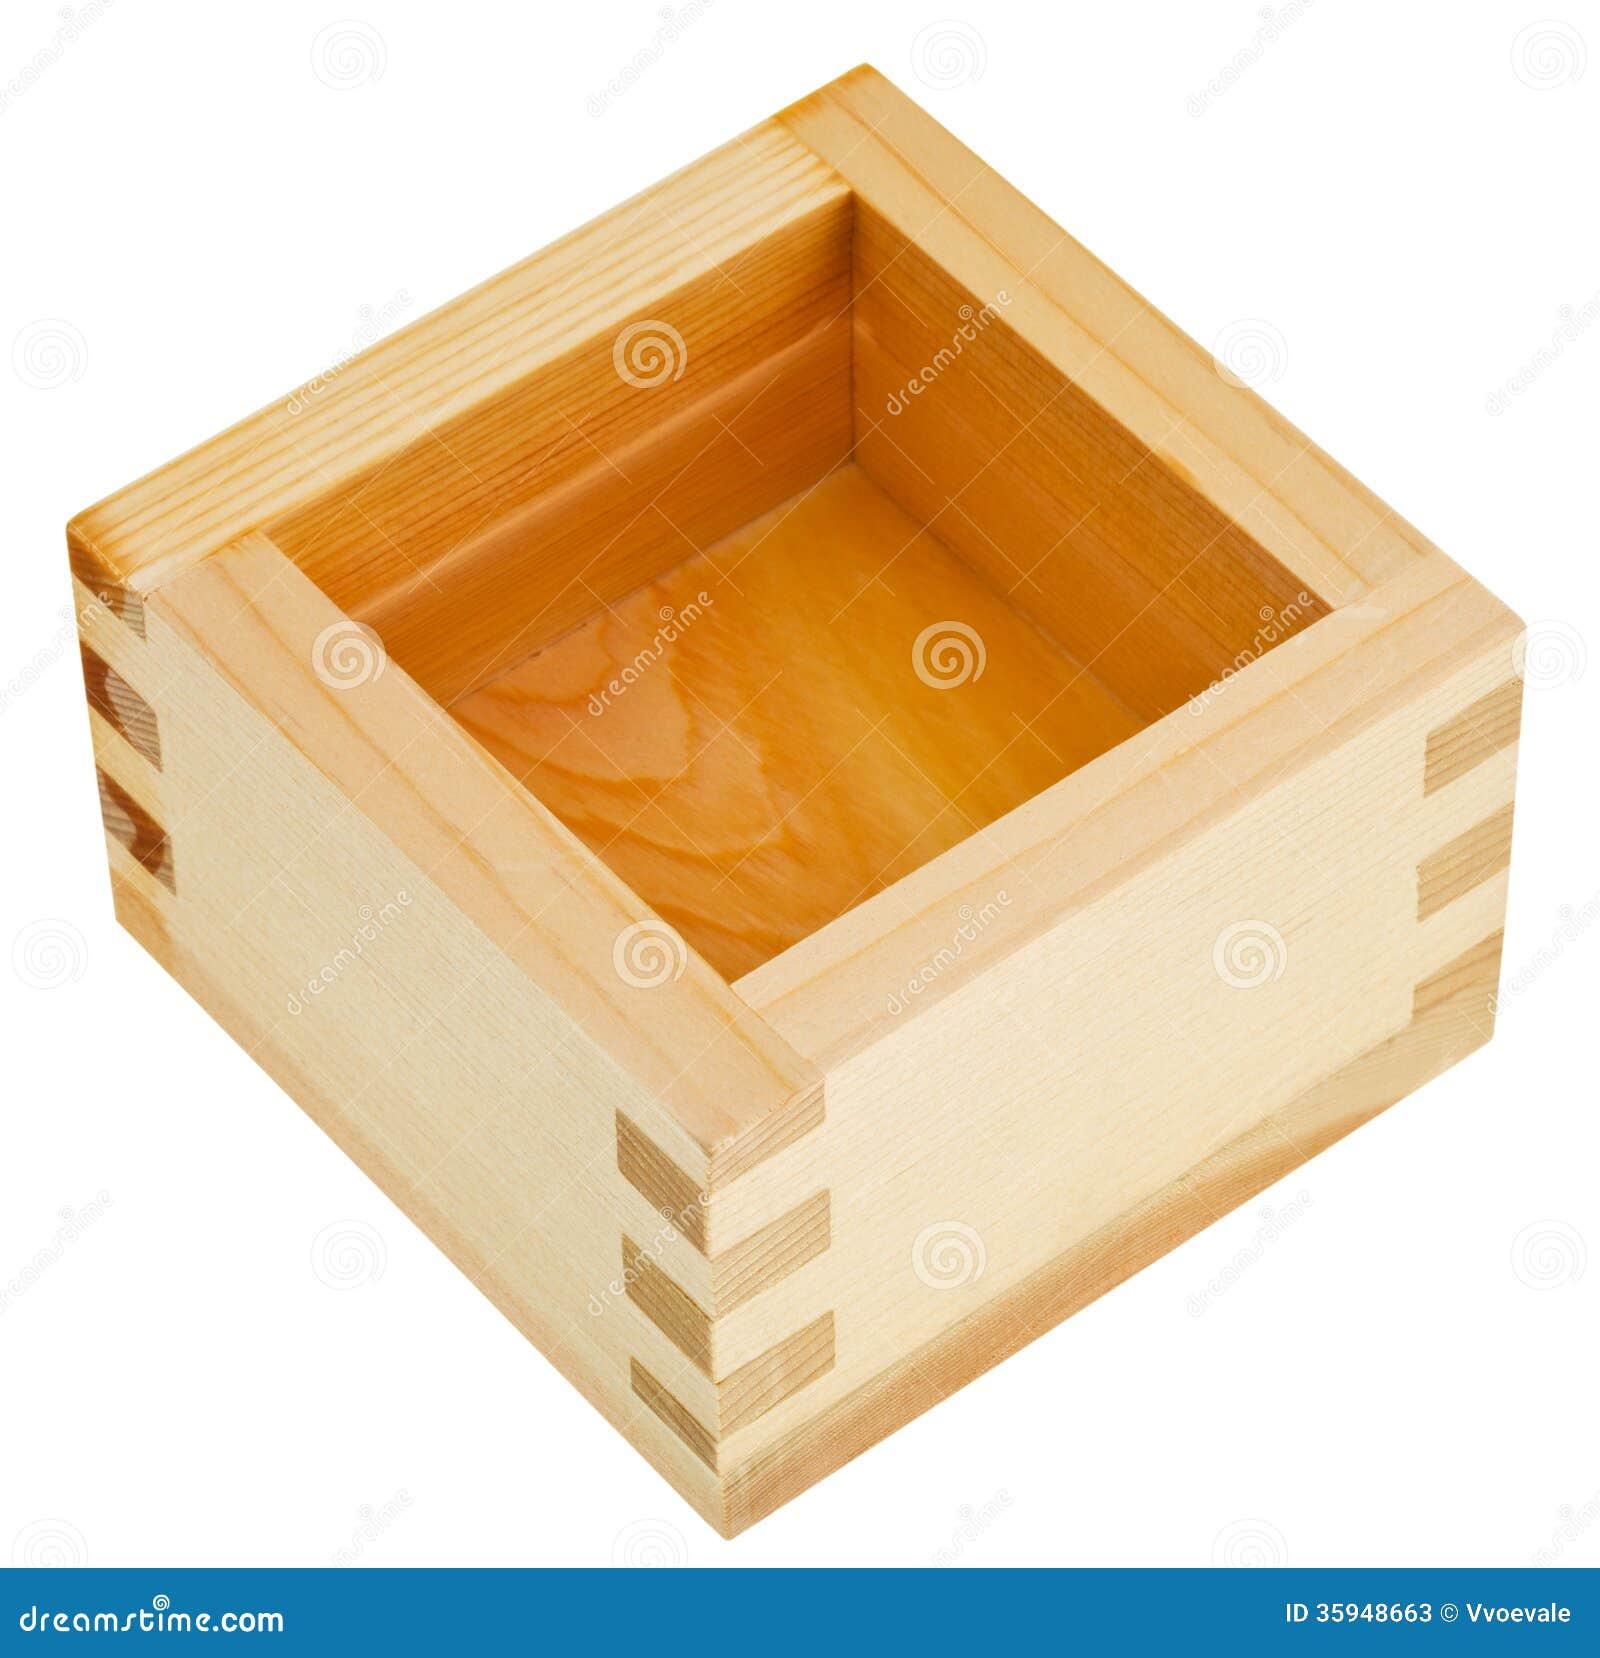 Japanese Wooden Box Masu With Sake Stock Photos - Image: 35948663